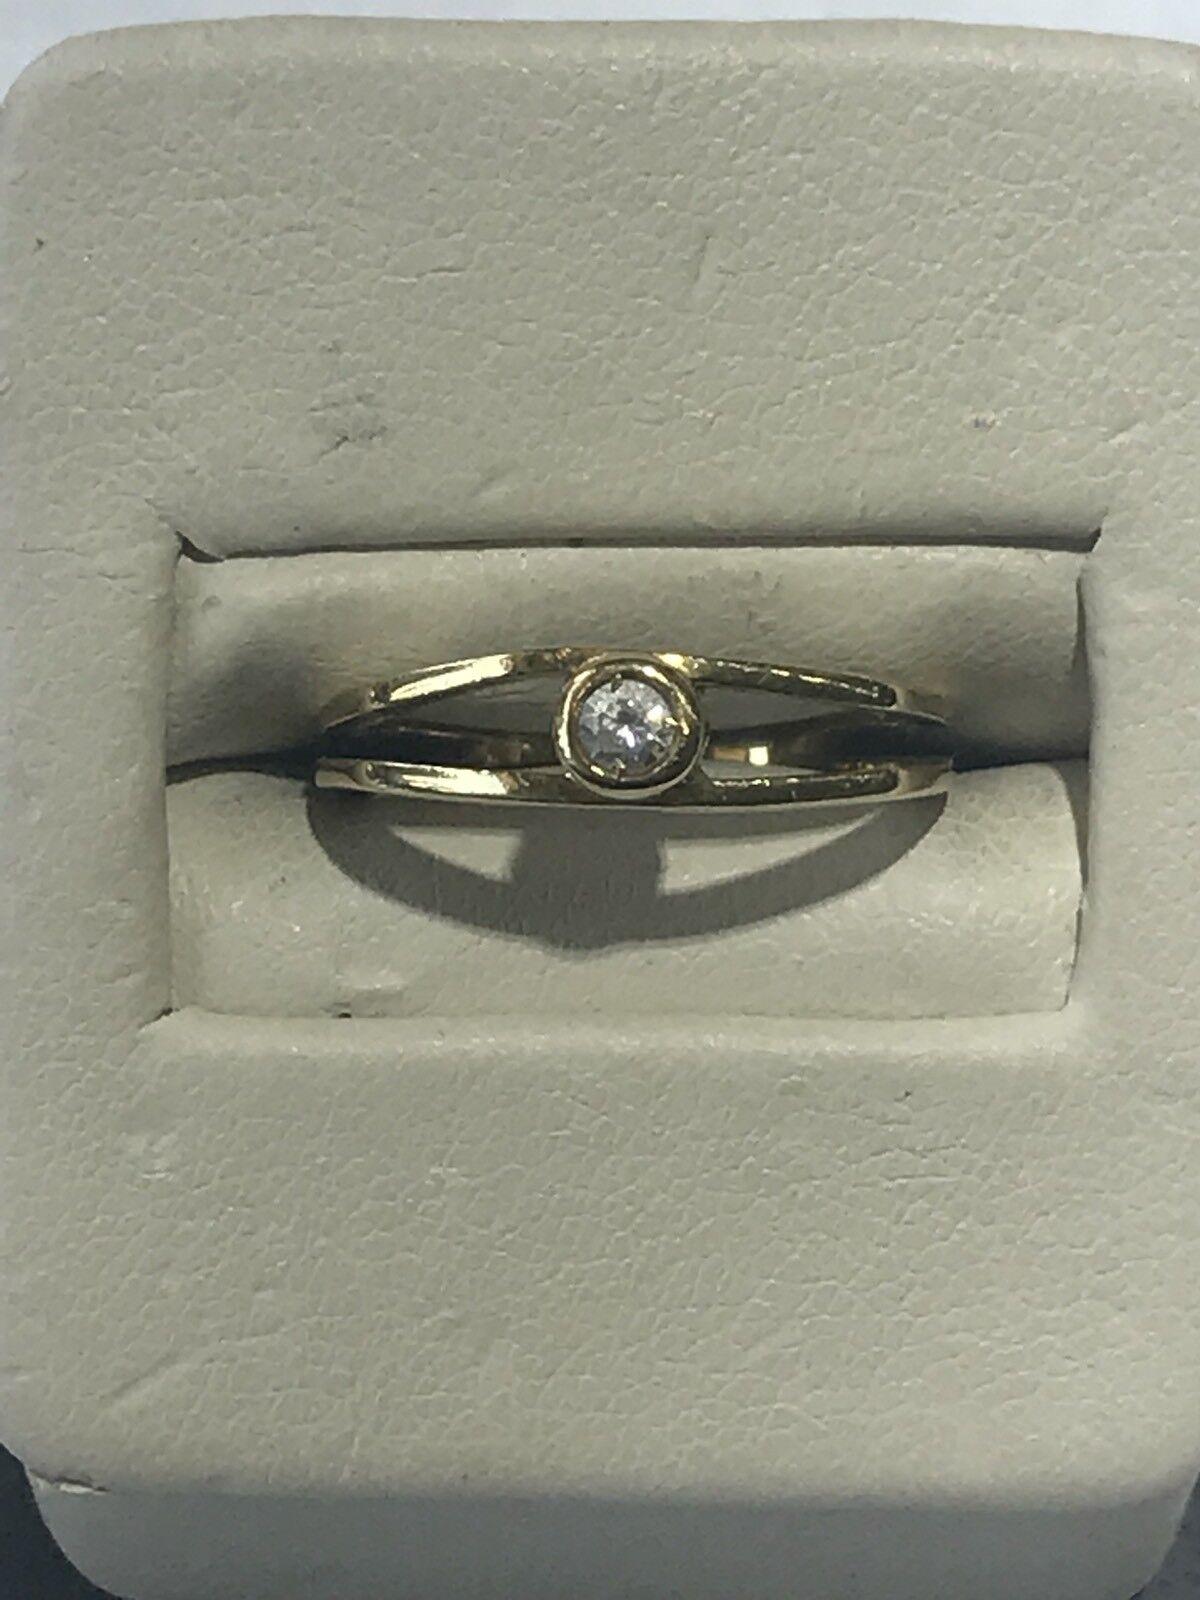 Gorgeous European 18KT Yellow gold Open Sided Simple Trendy Round Diamond Ring